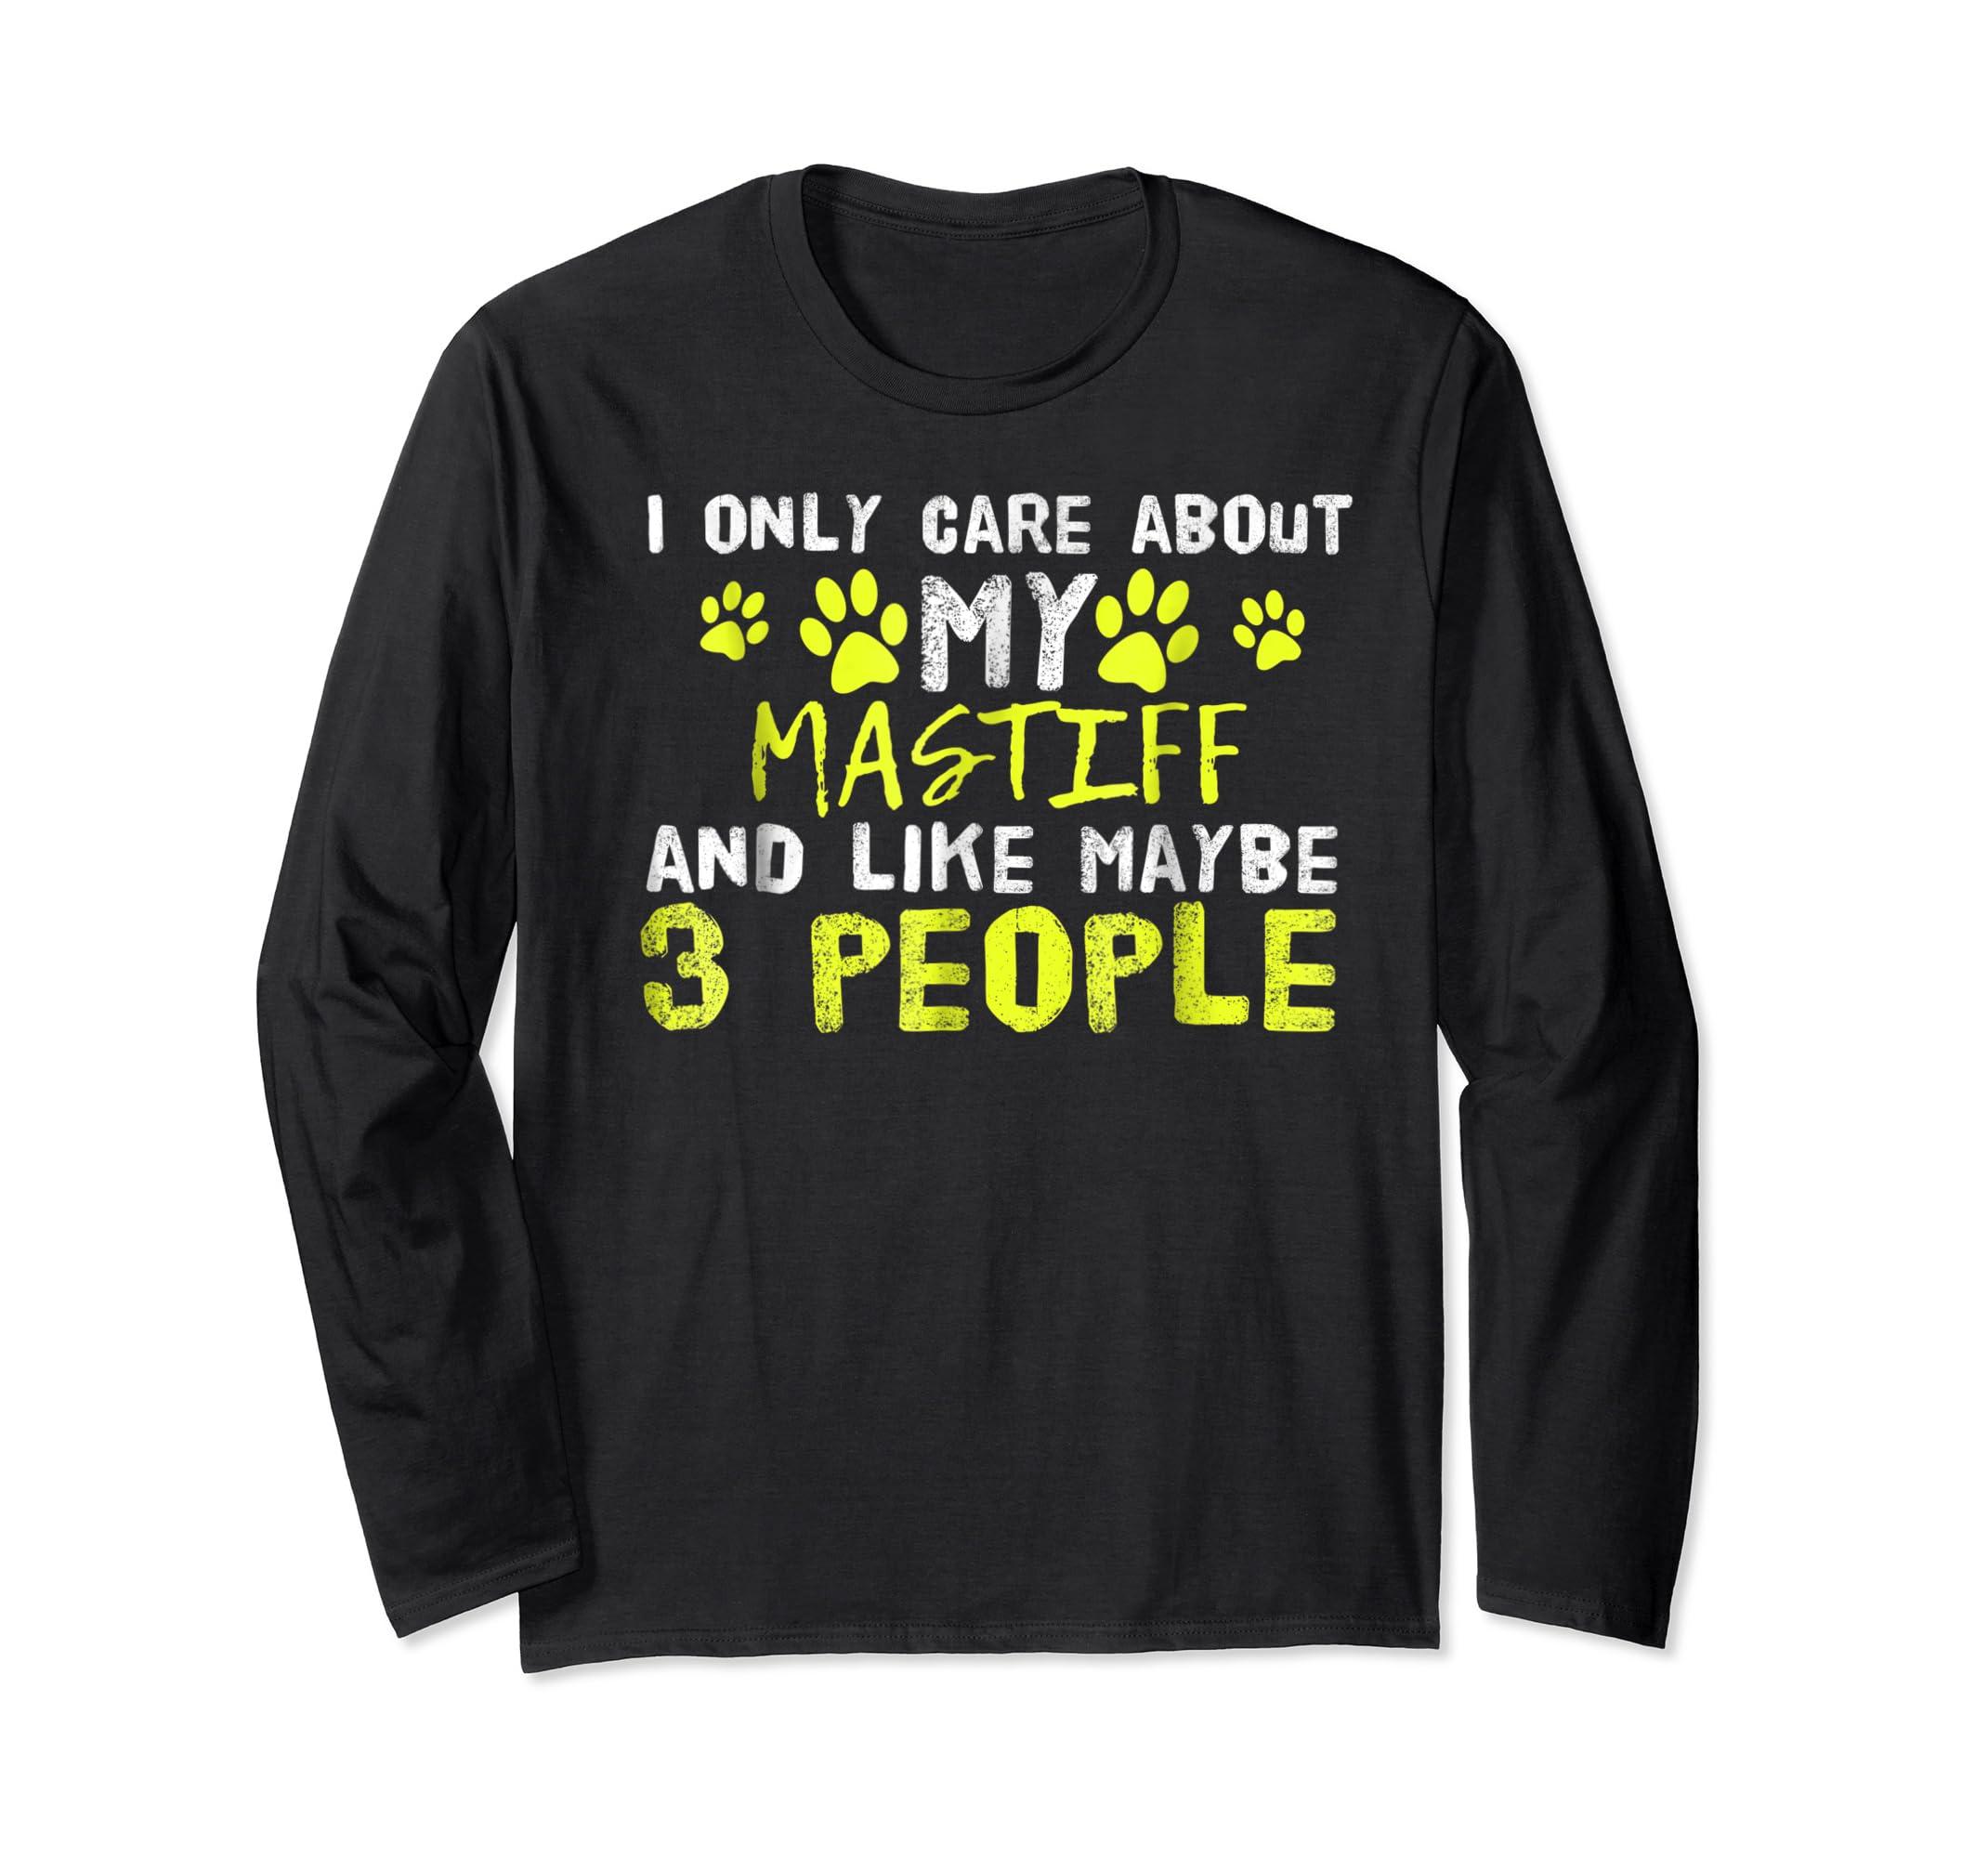 Mastiff Dog Shirt Introvert Love My Dog Tee-Long Sleeve-Black